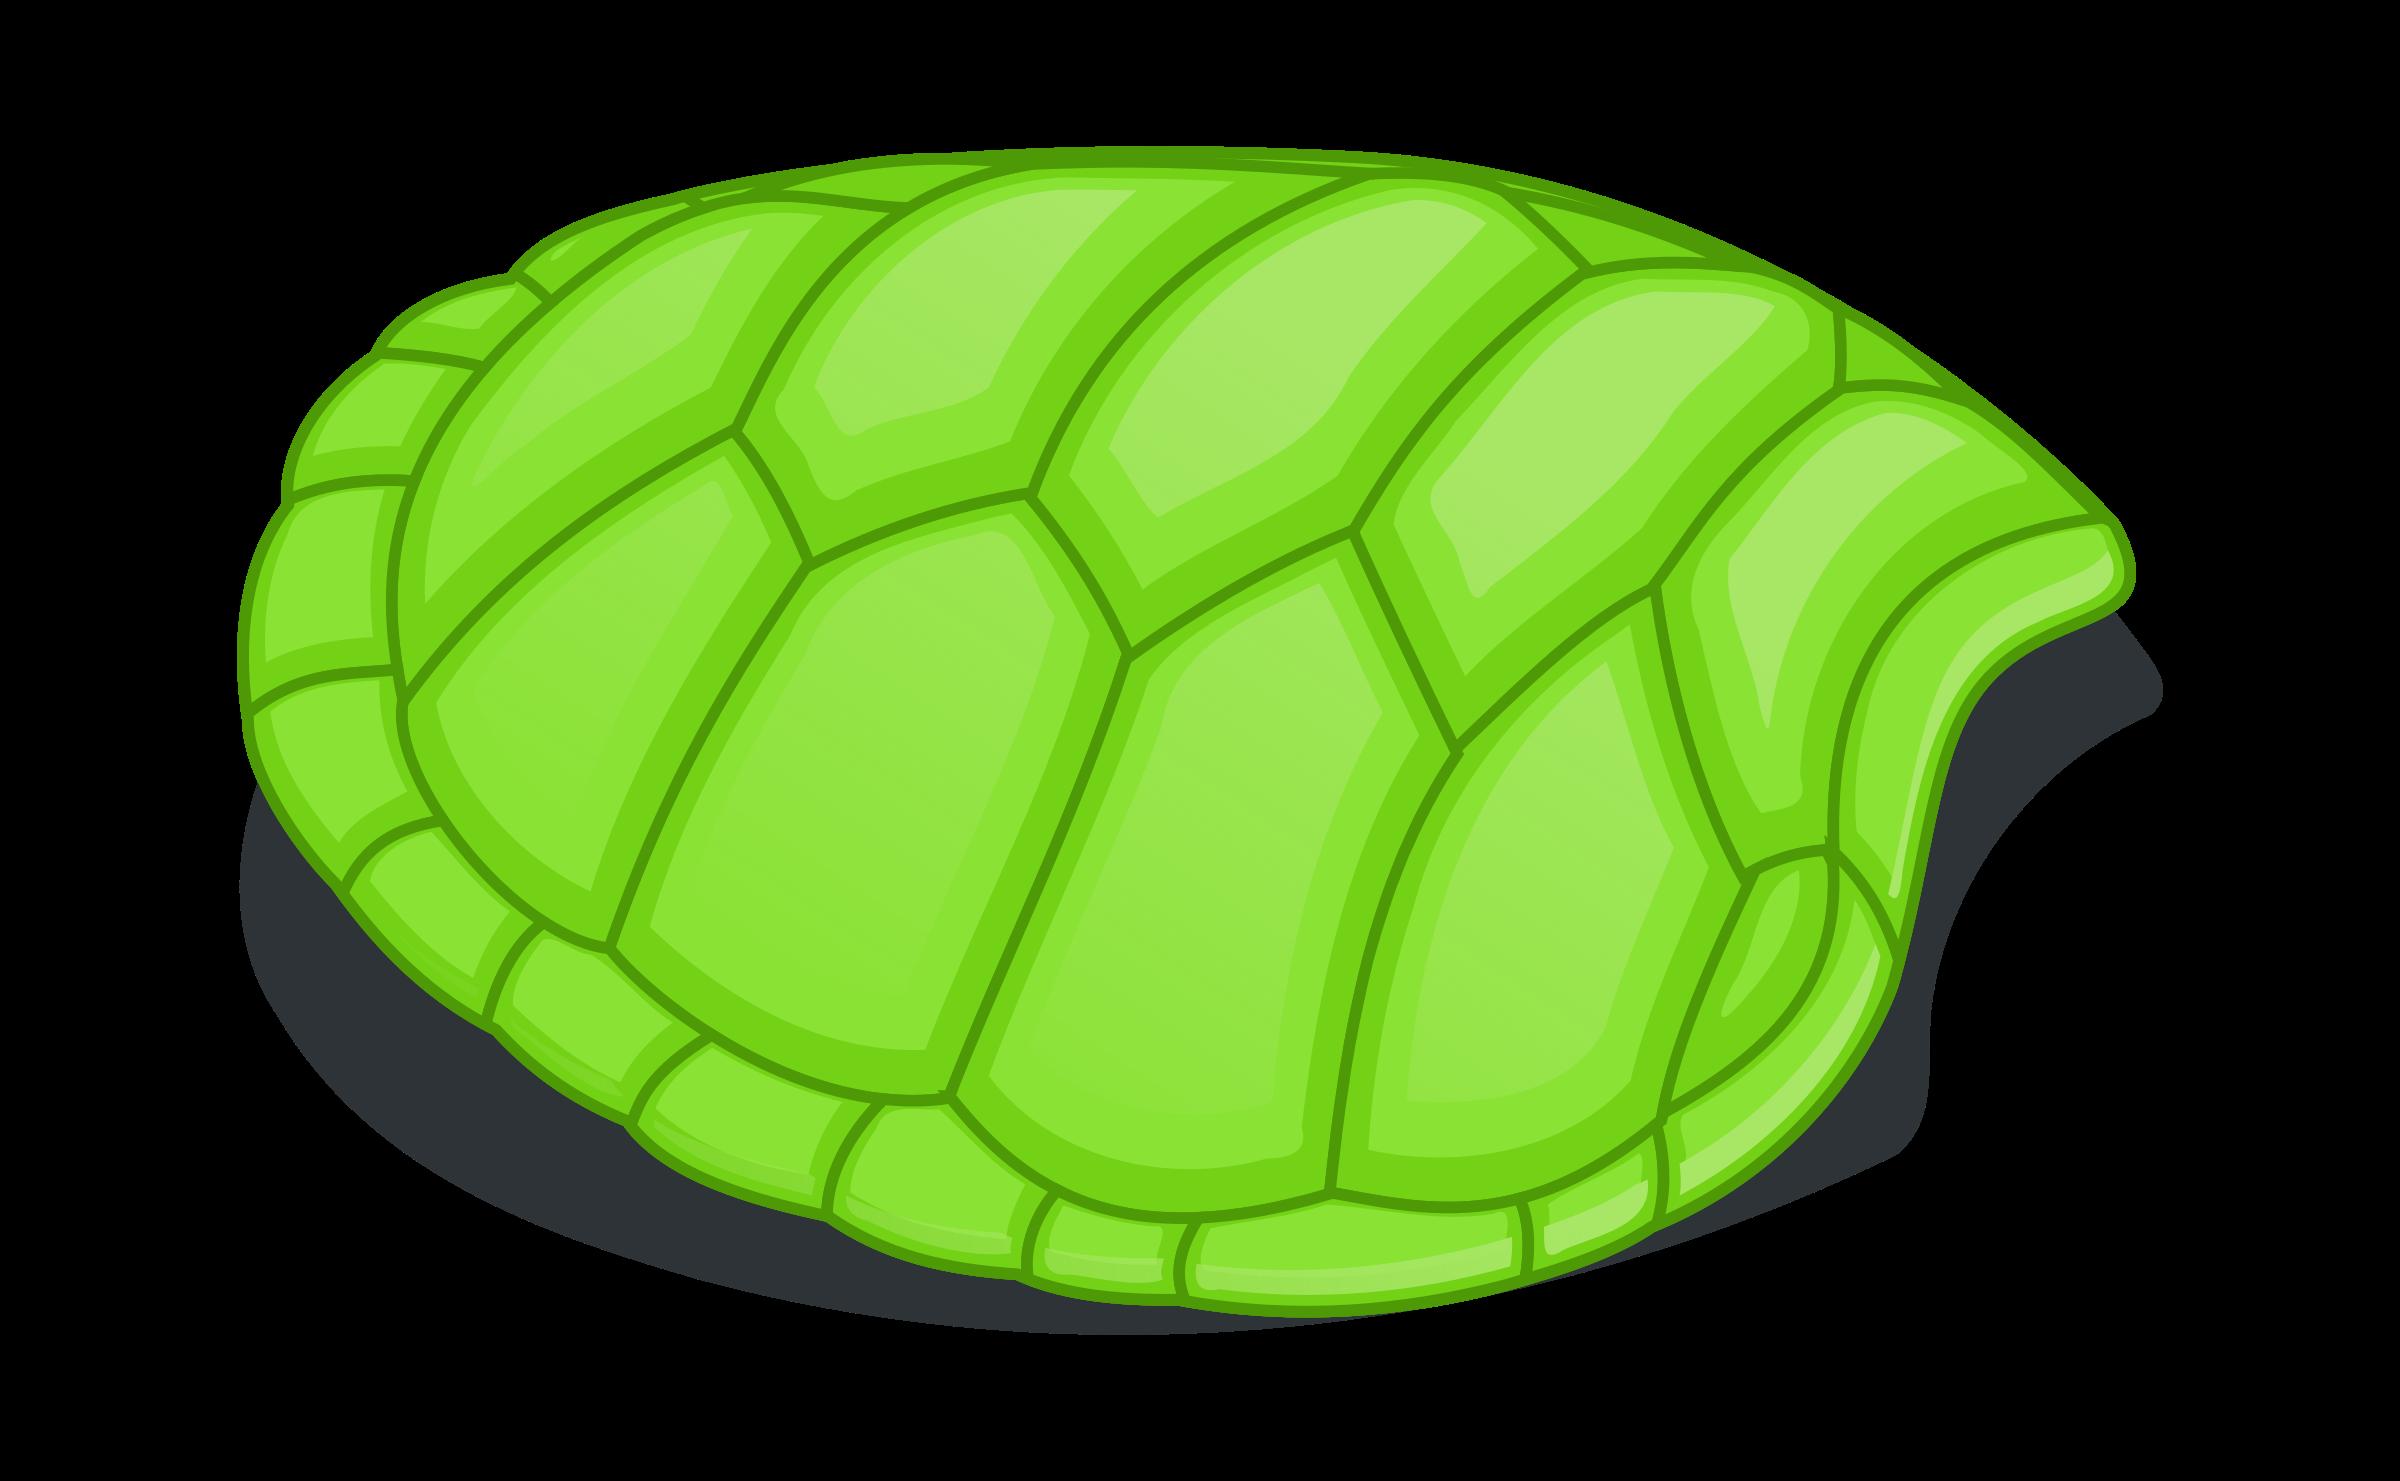 Hoof of big image. Clipart turtle green turtle